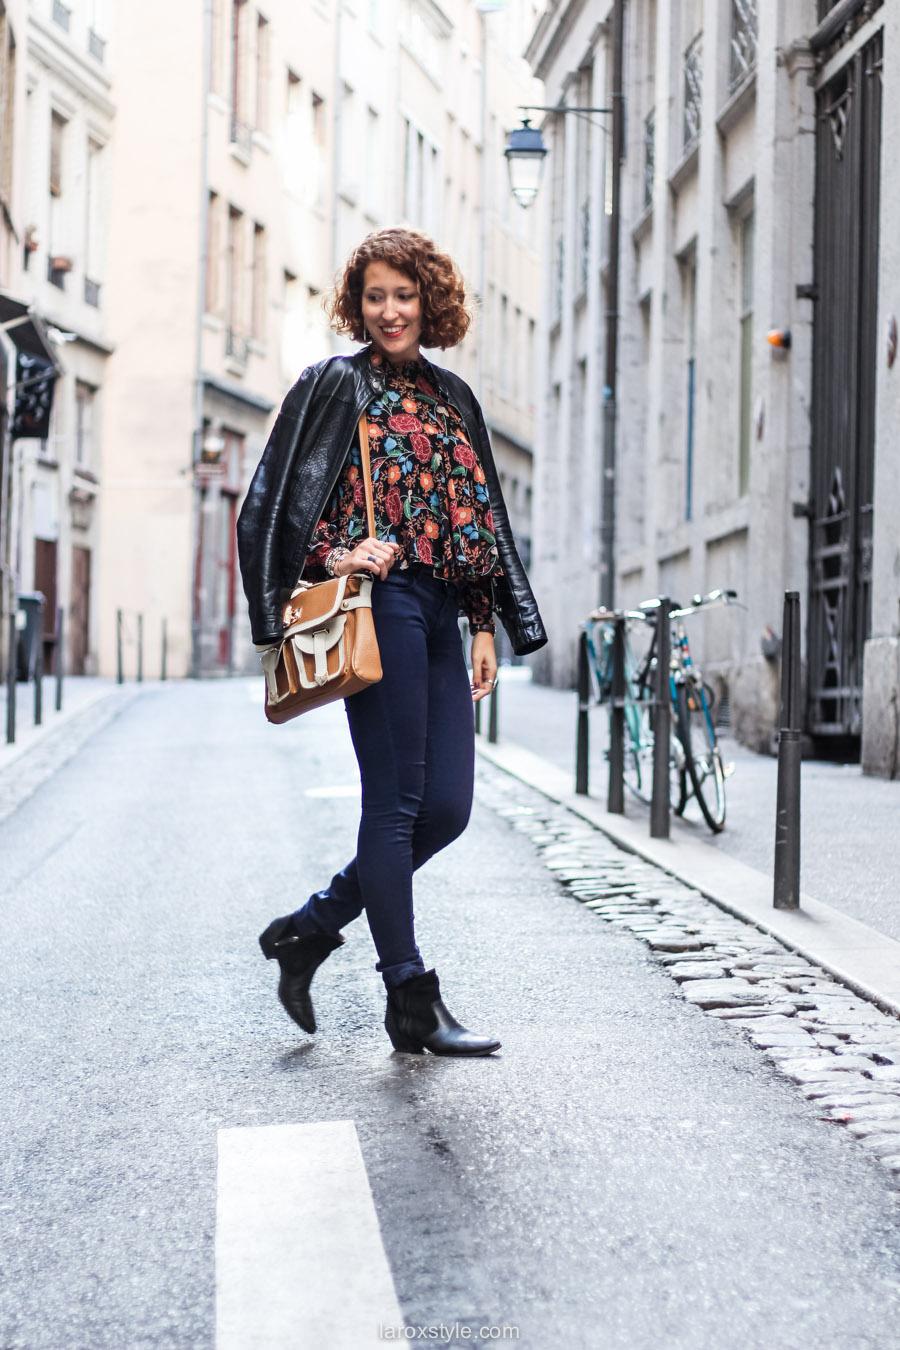 blouse fleurie - sac vintage - laroxstyle blog mode lyon-11